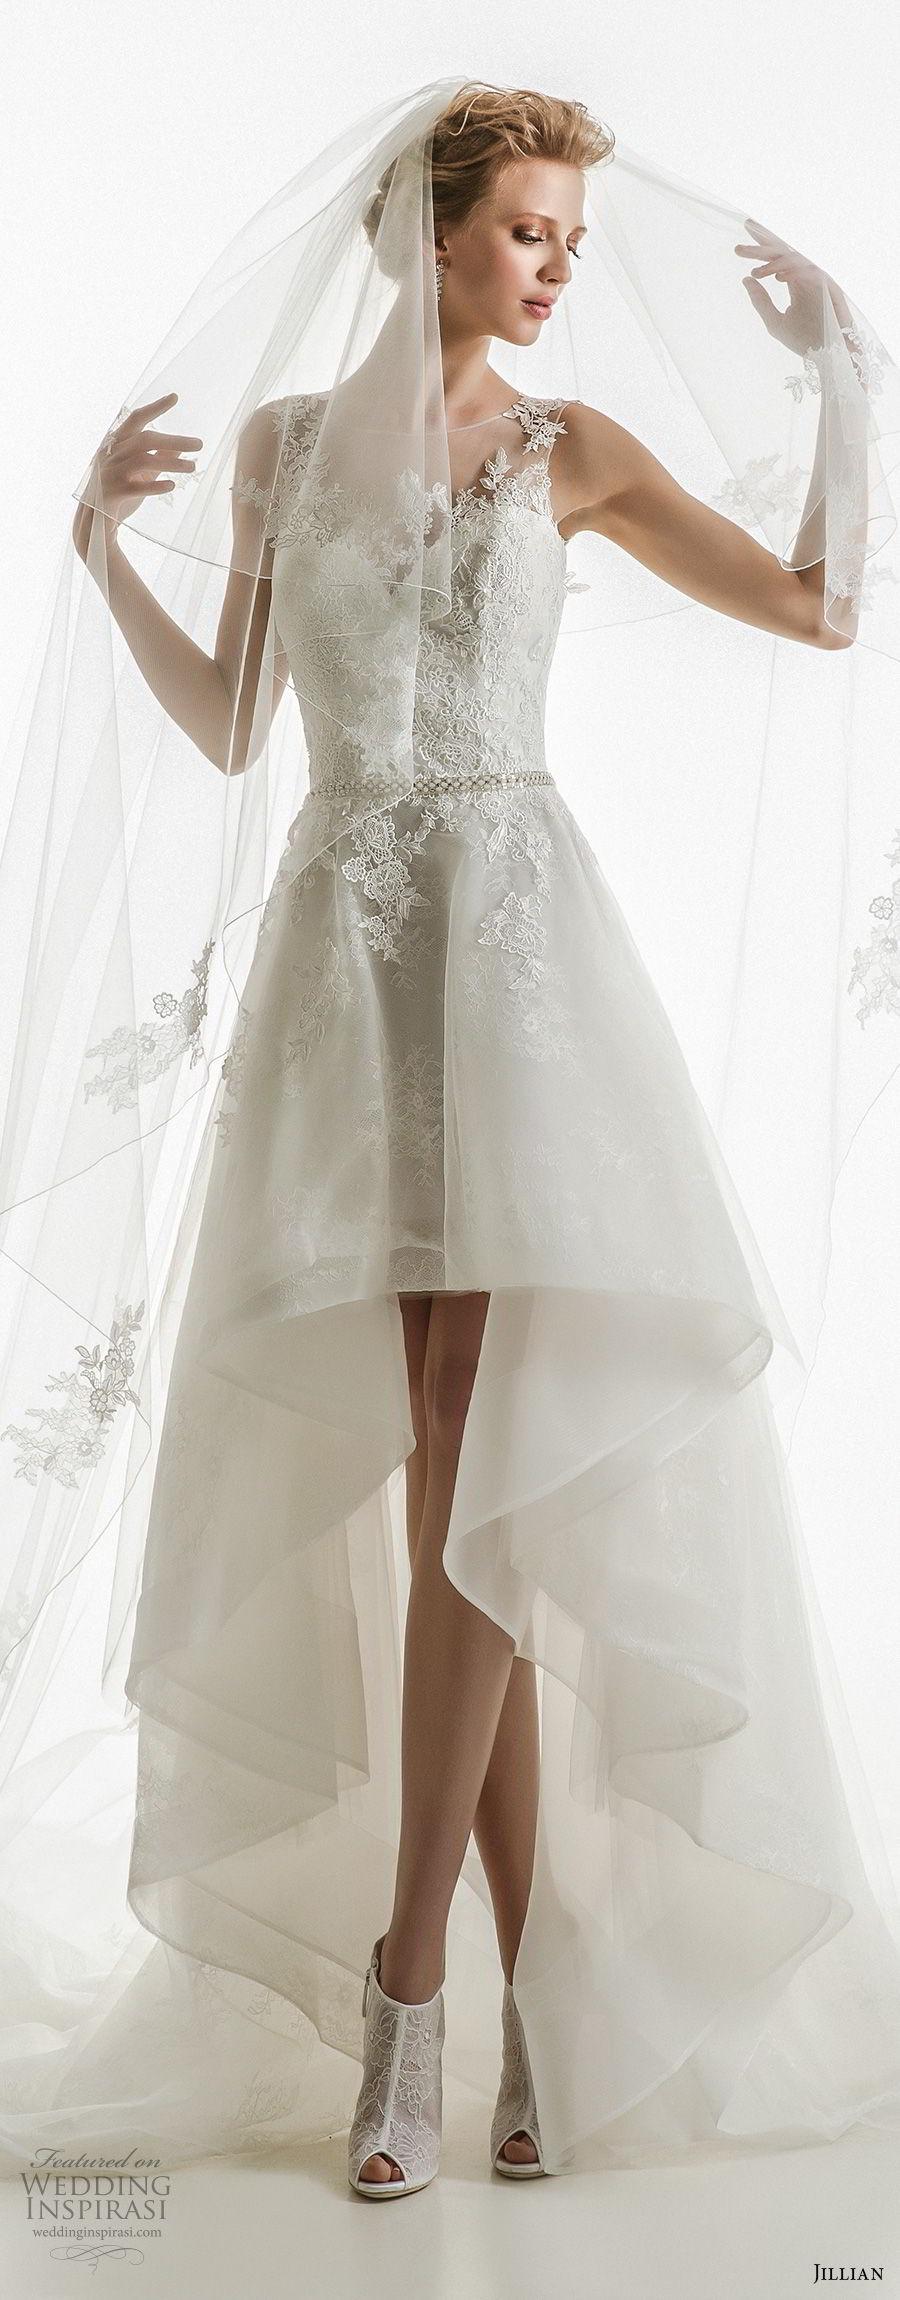 jillian 2018 bridal sleeveless illusion jewel sweetheart neckline heavily embellished bodice romantic high low wedding dress chapel train (31) mv